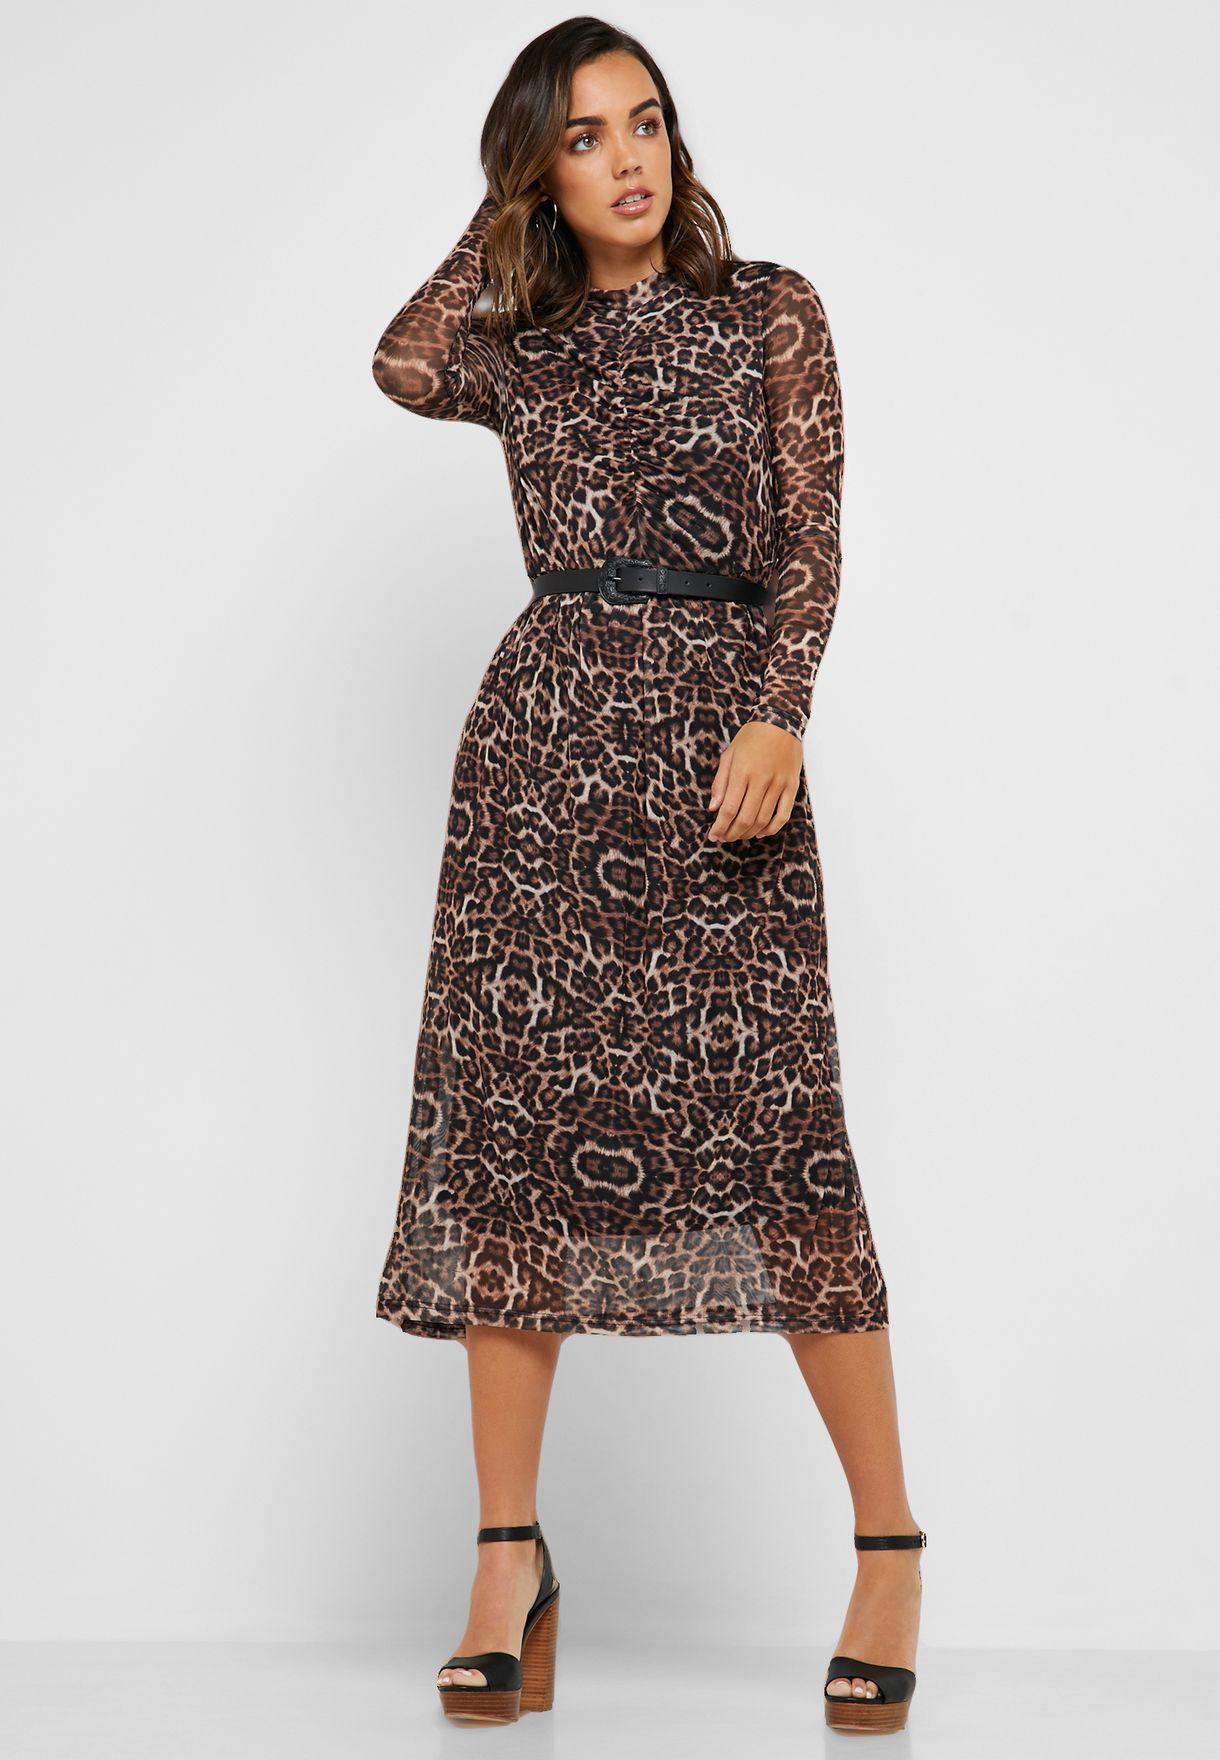 Leopard Print Mesh Overlay Dress